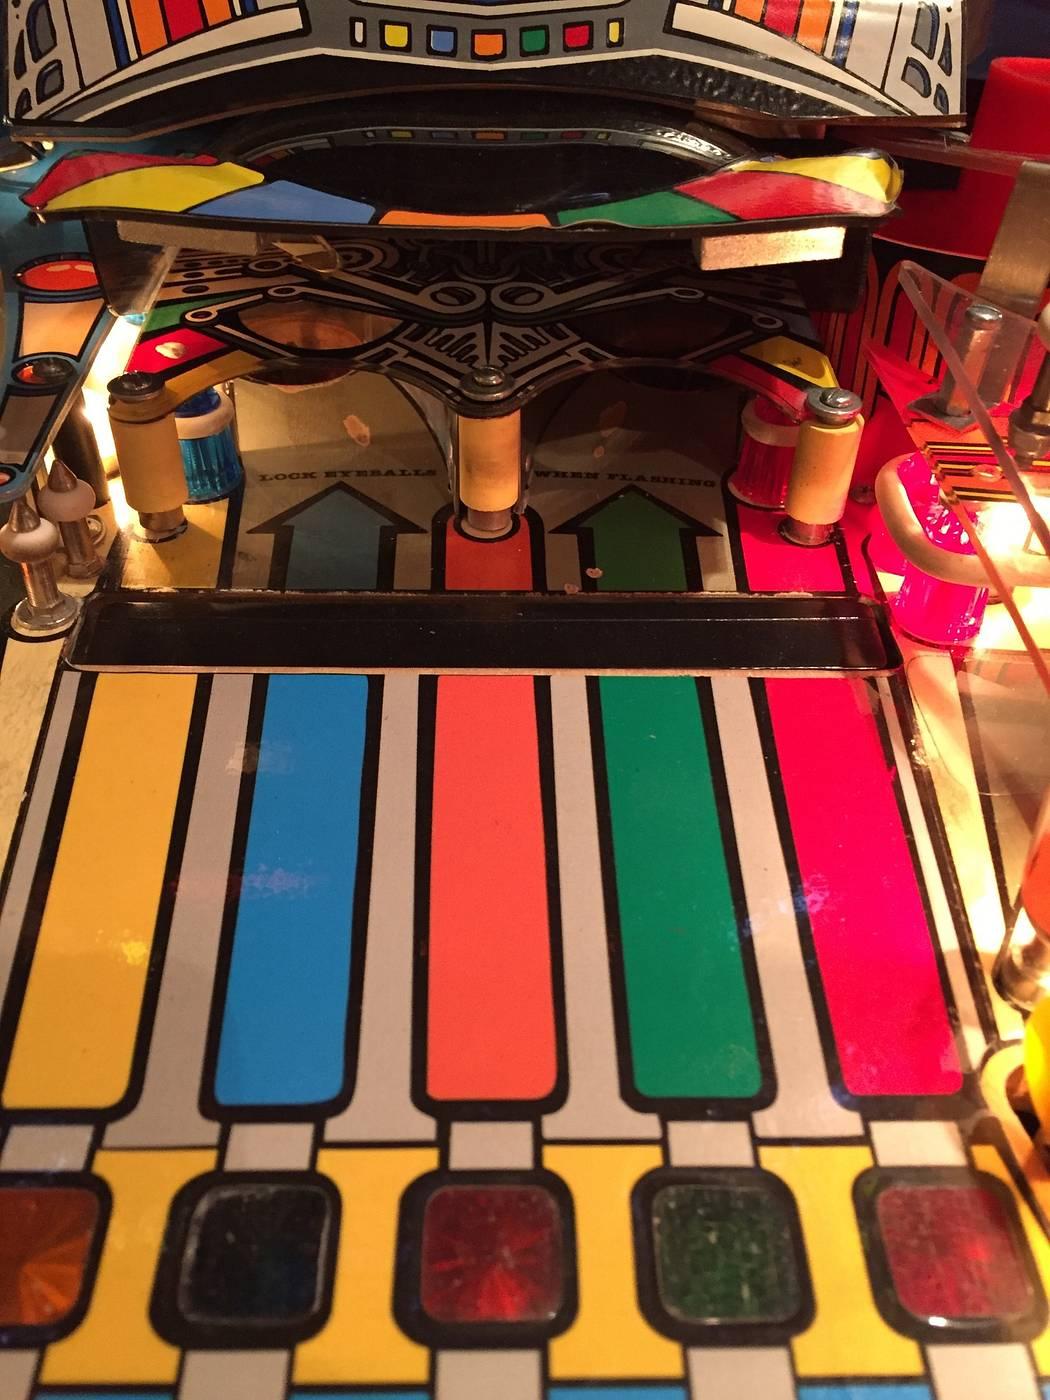 of pinbot pinball machine for sale